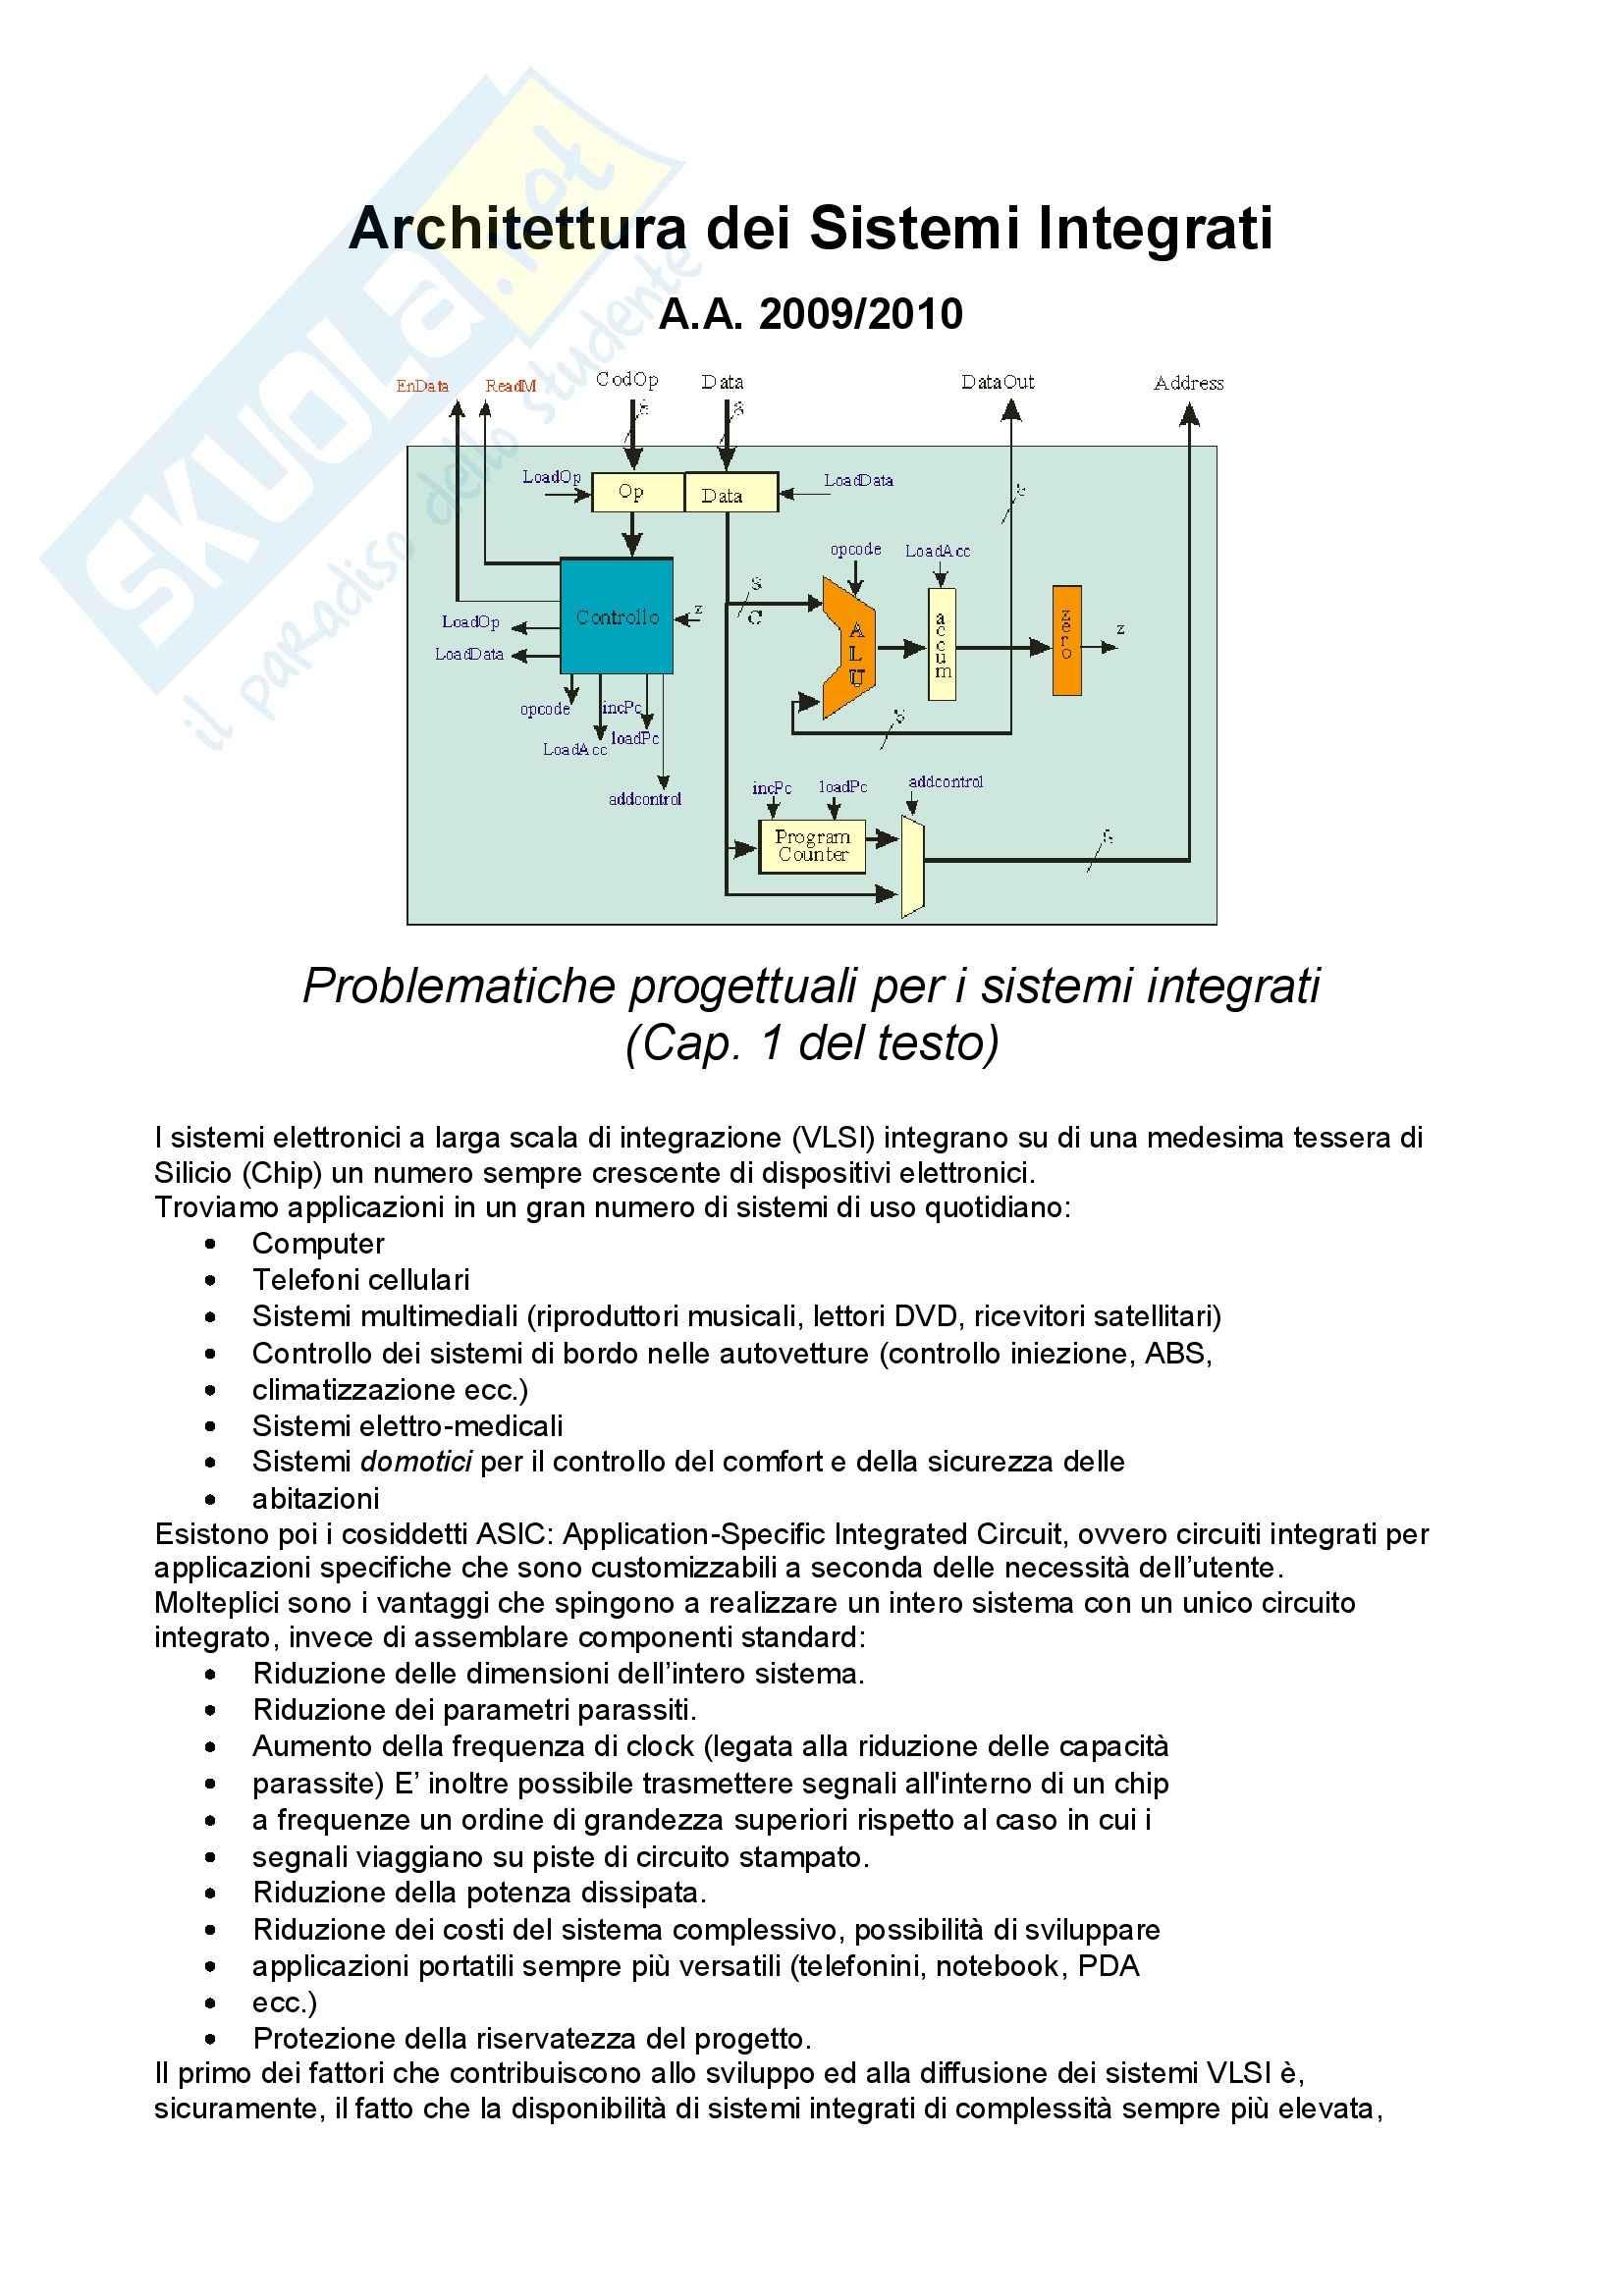 ASI architetture sistemi integrati - ASI sbobinati